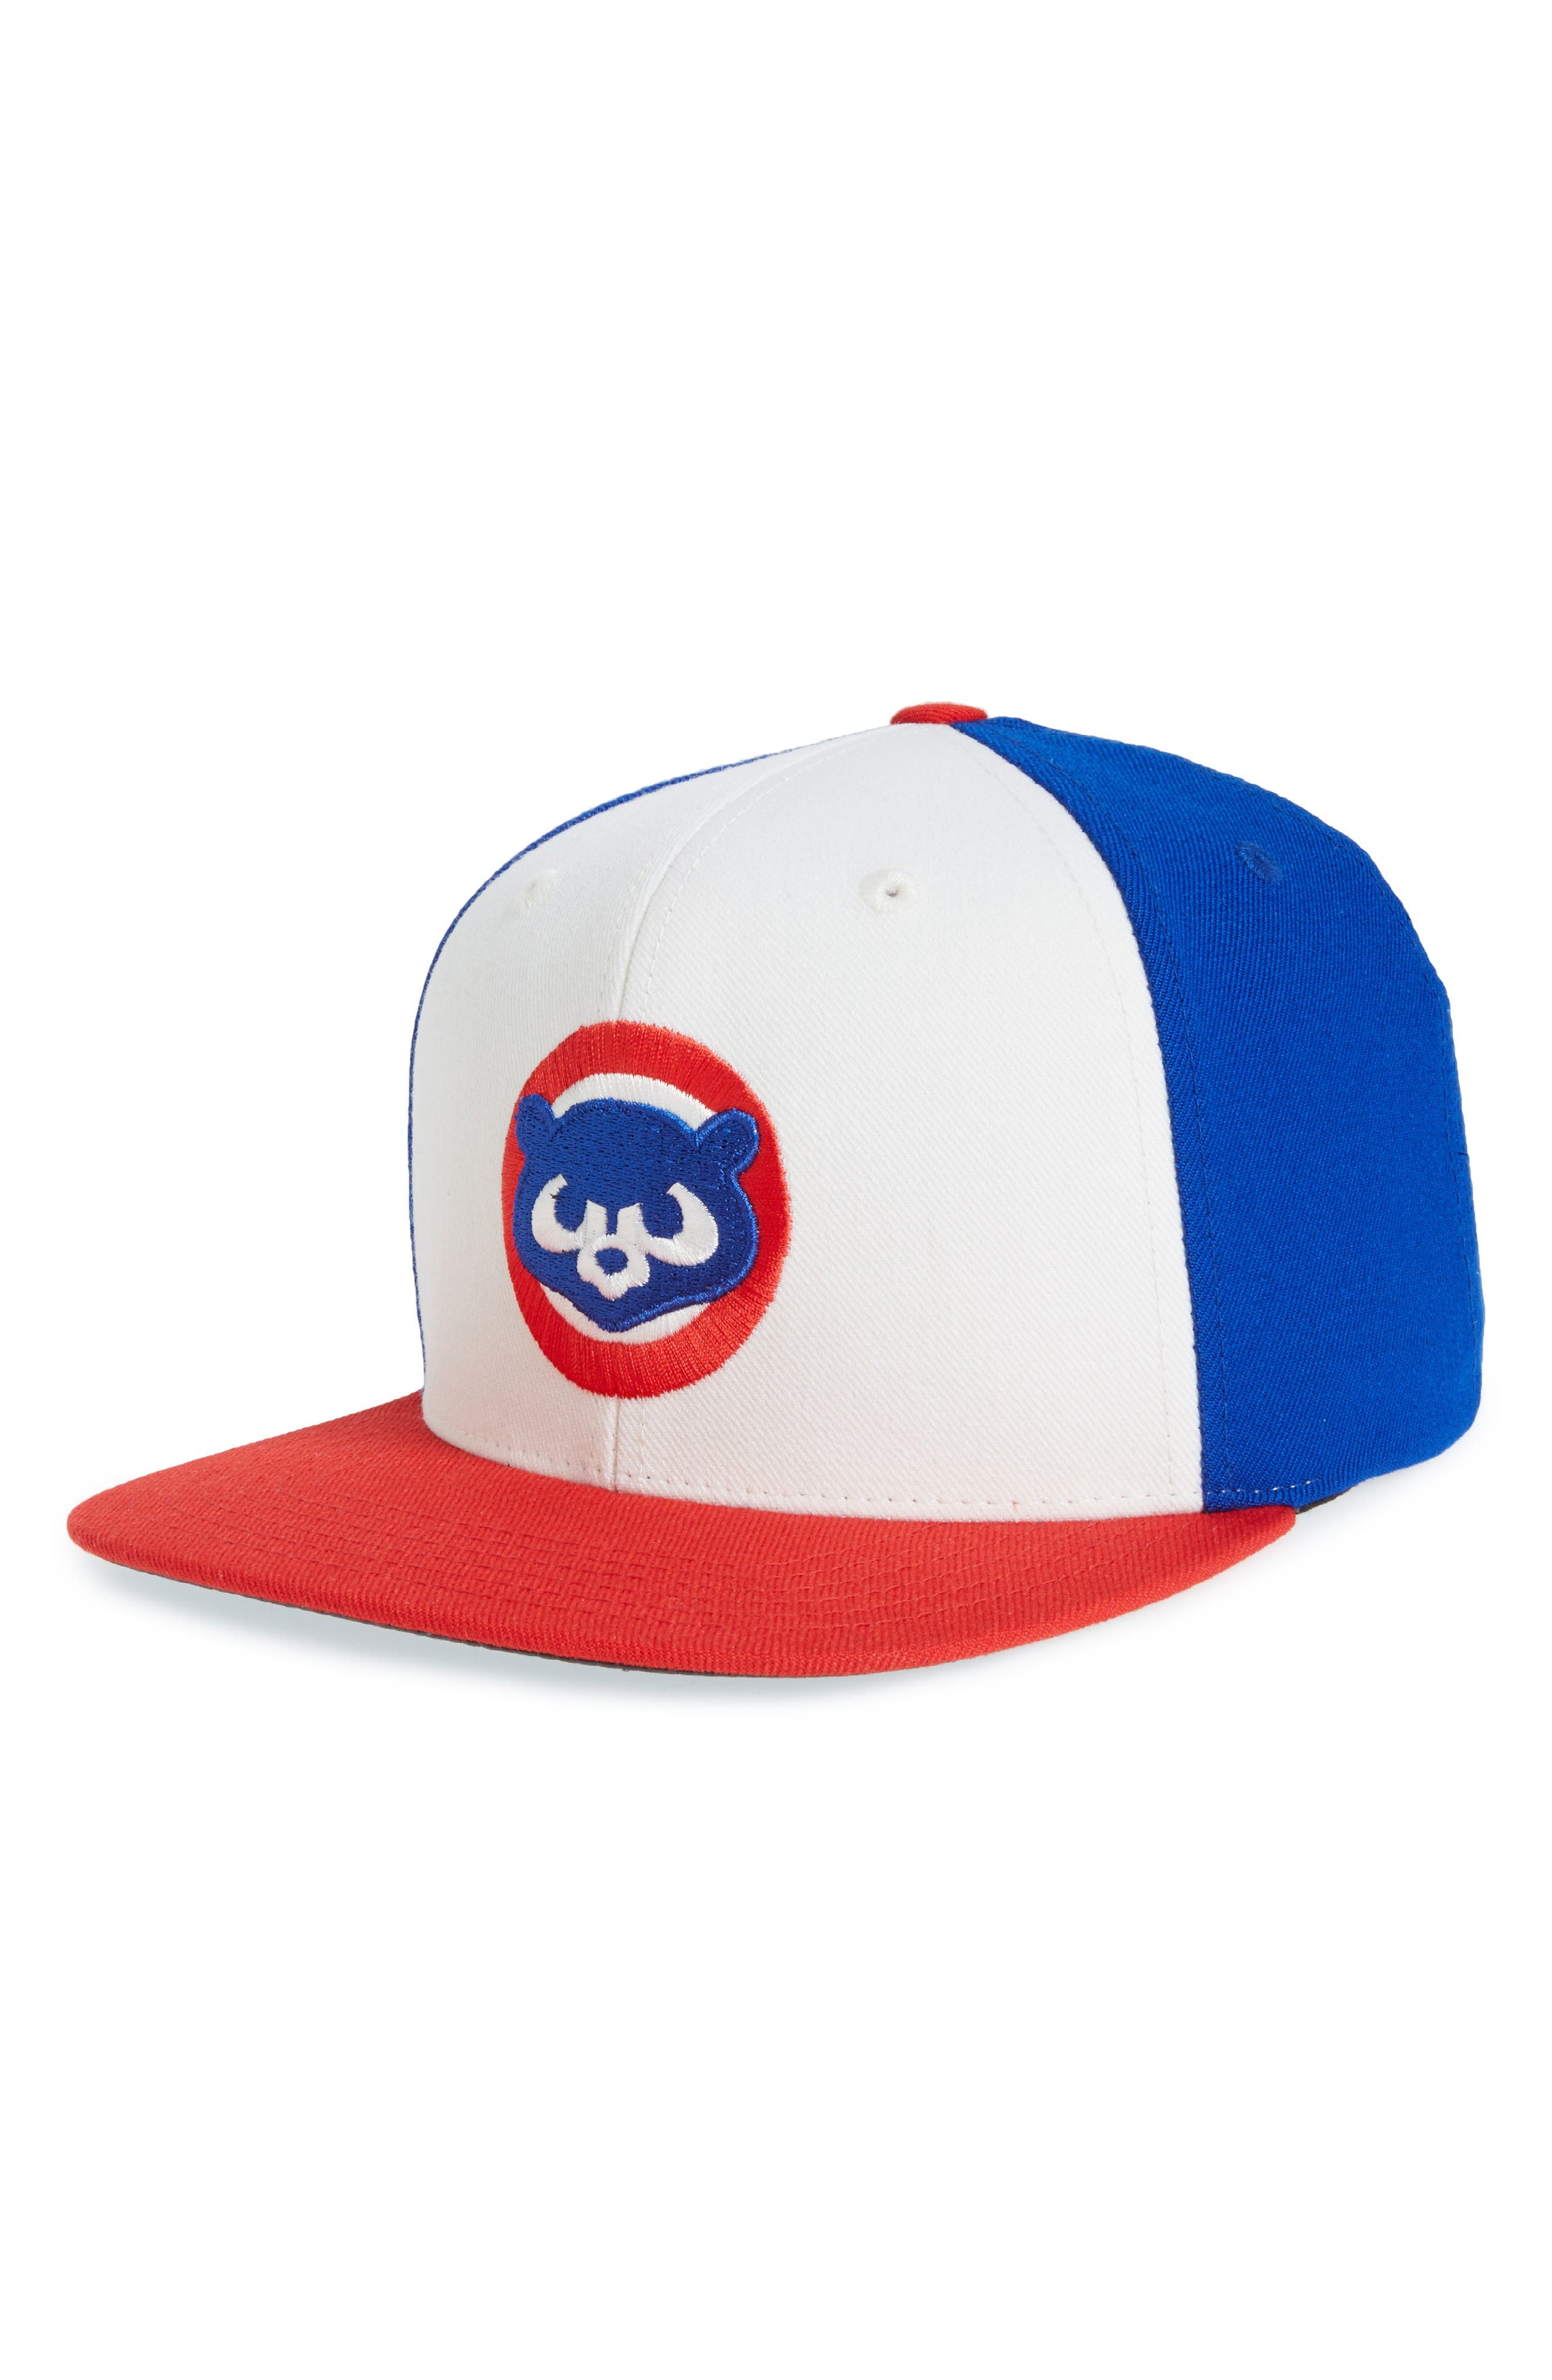 Main Image - American Needle The Big Show MLB Snapback Baseball Cap